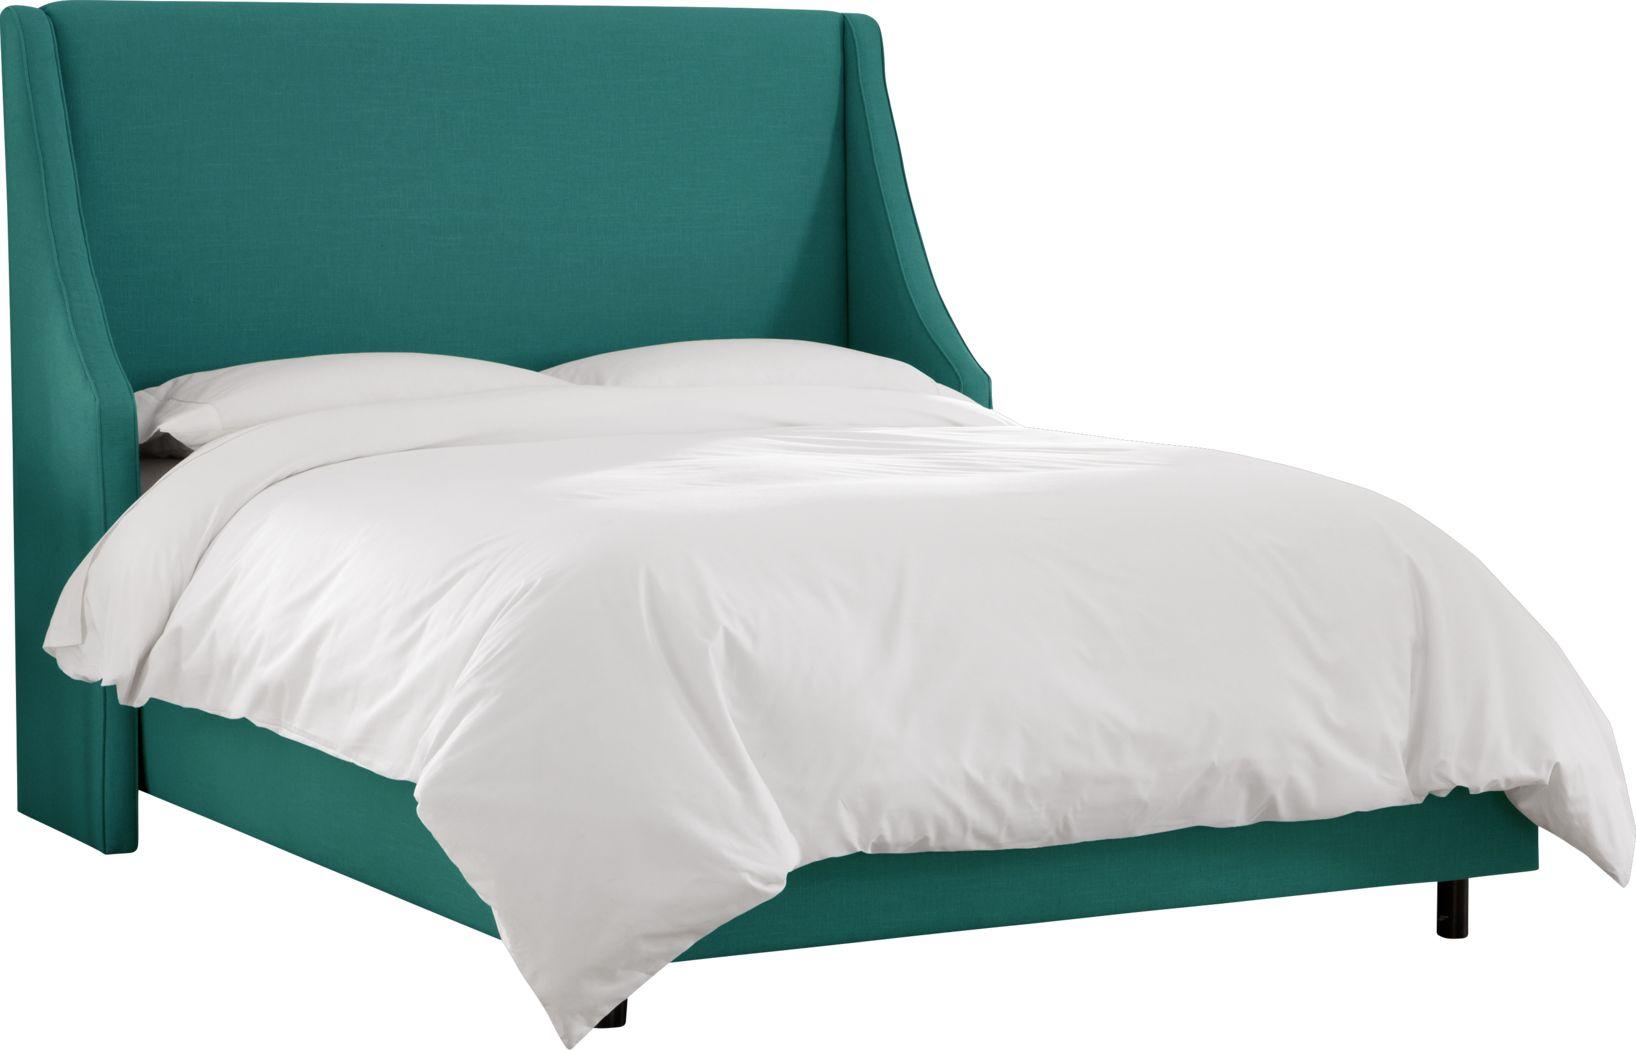 Aviana Laguna King Bed